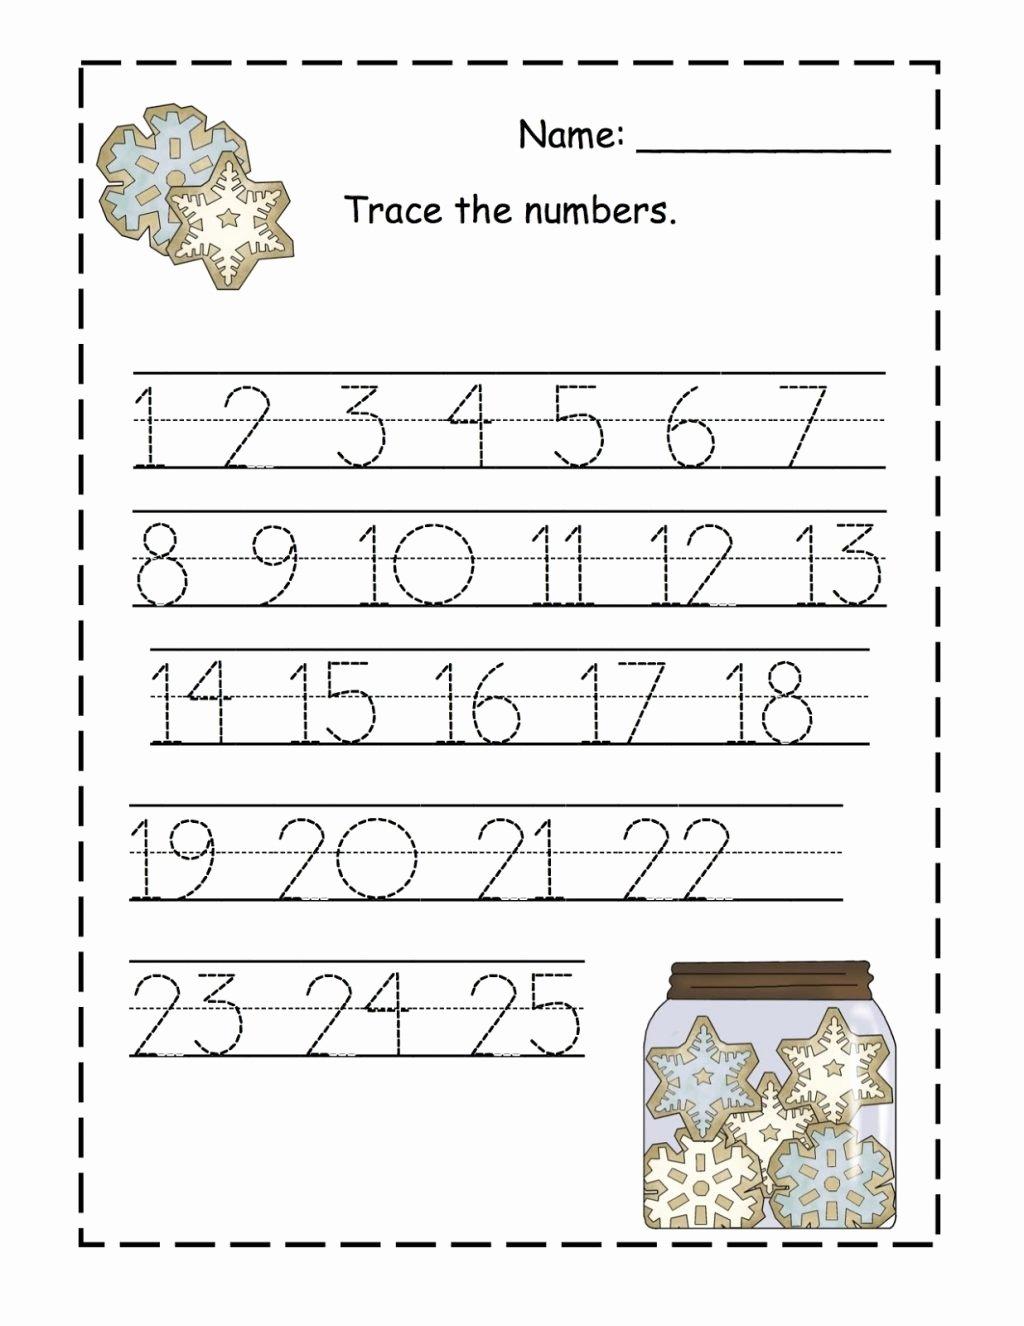 Name Writing Worksheets for Preschoolers Lovely Worksheet Worksheet Name Writing Worksheets Tracing